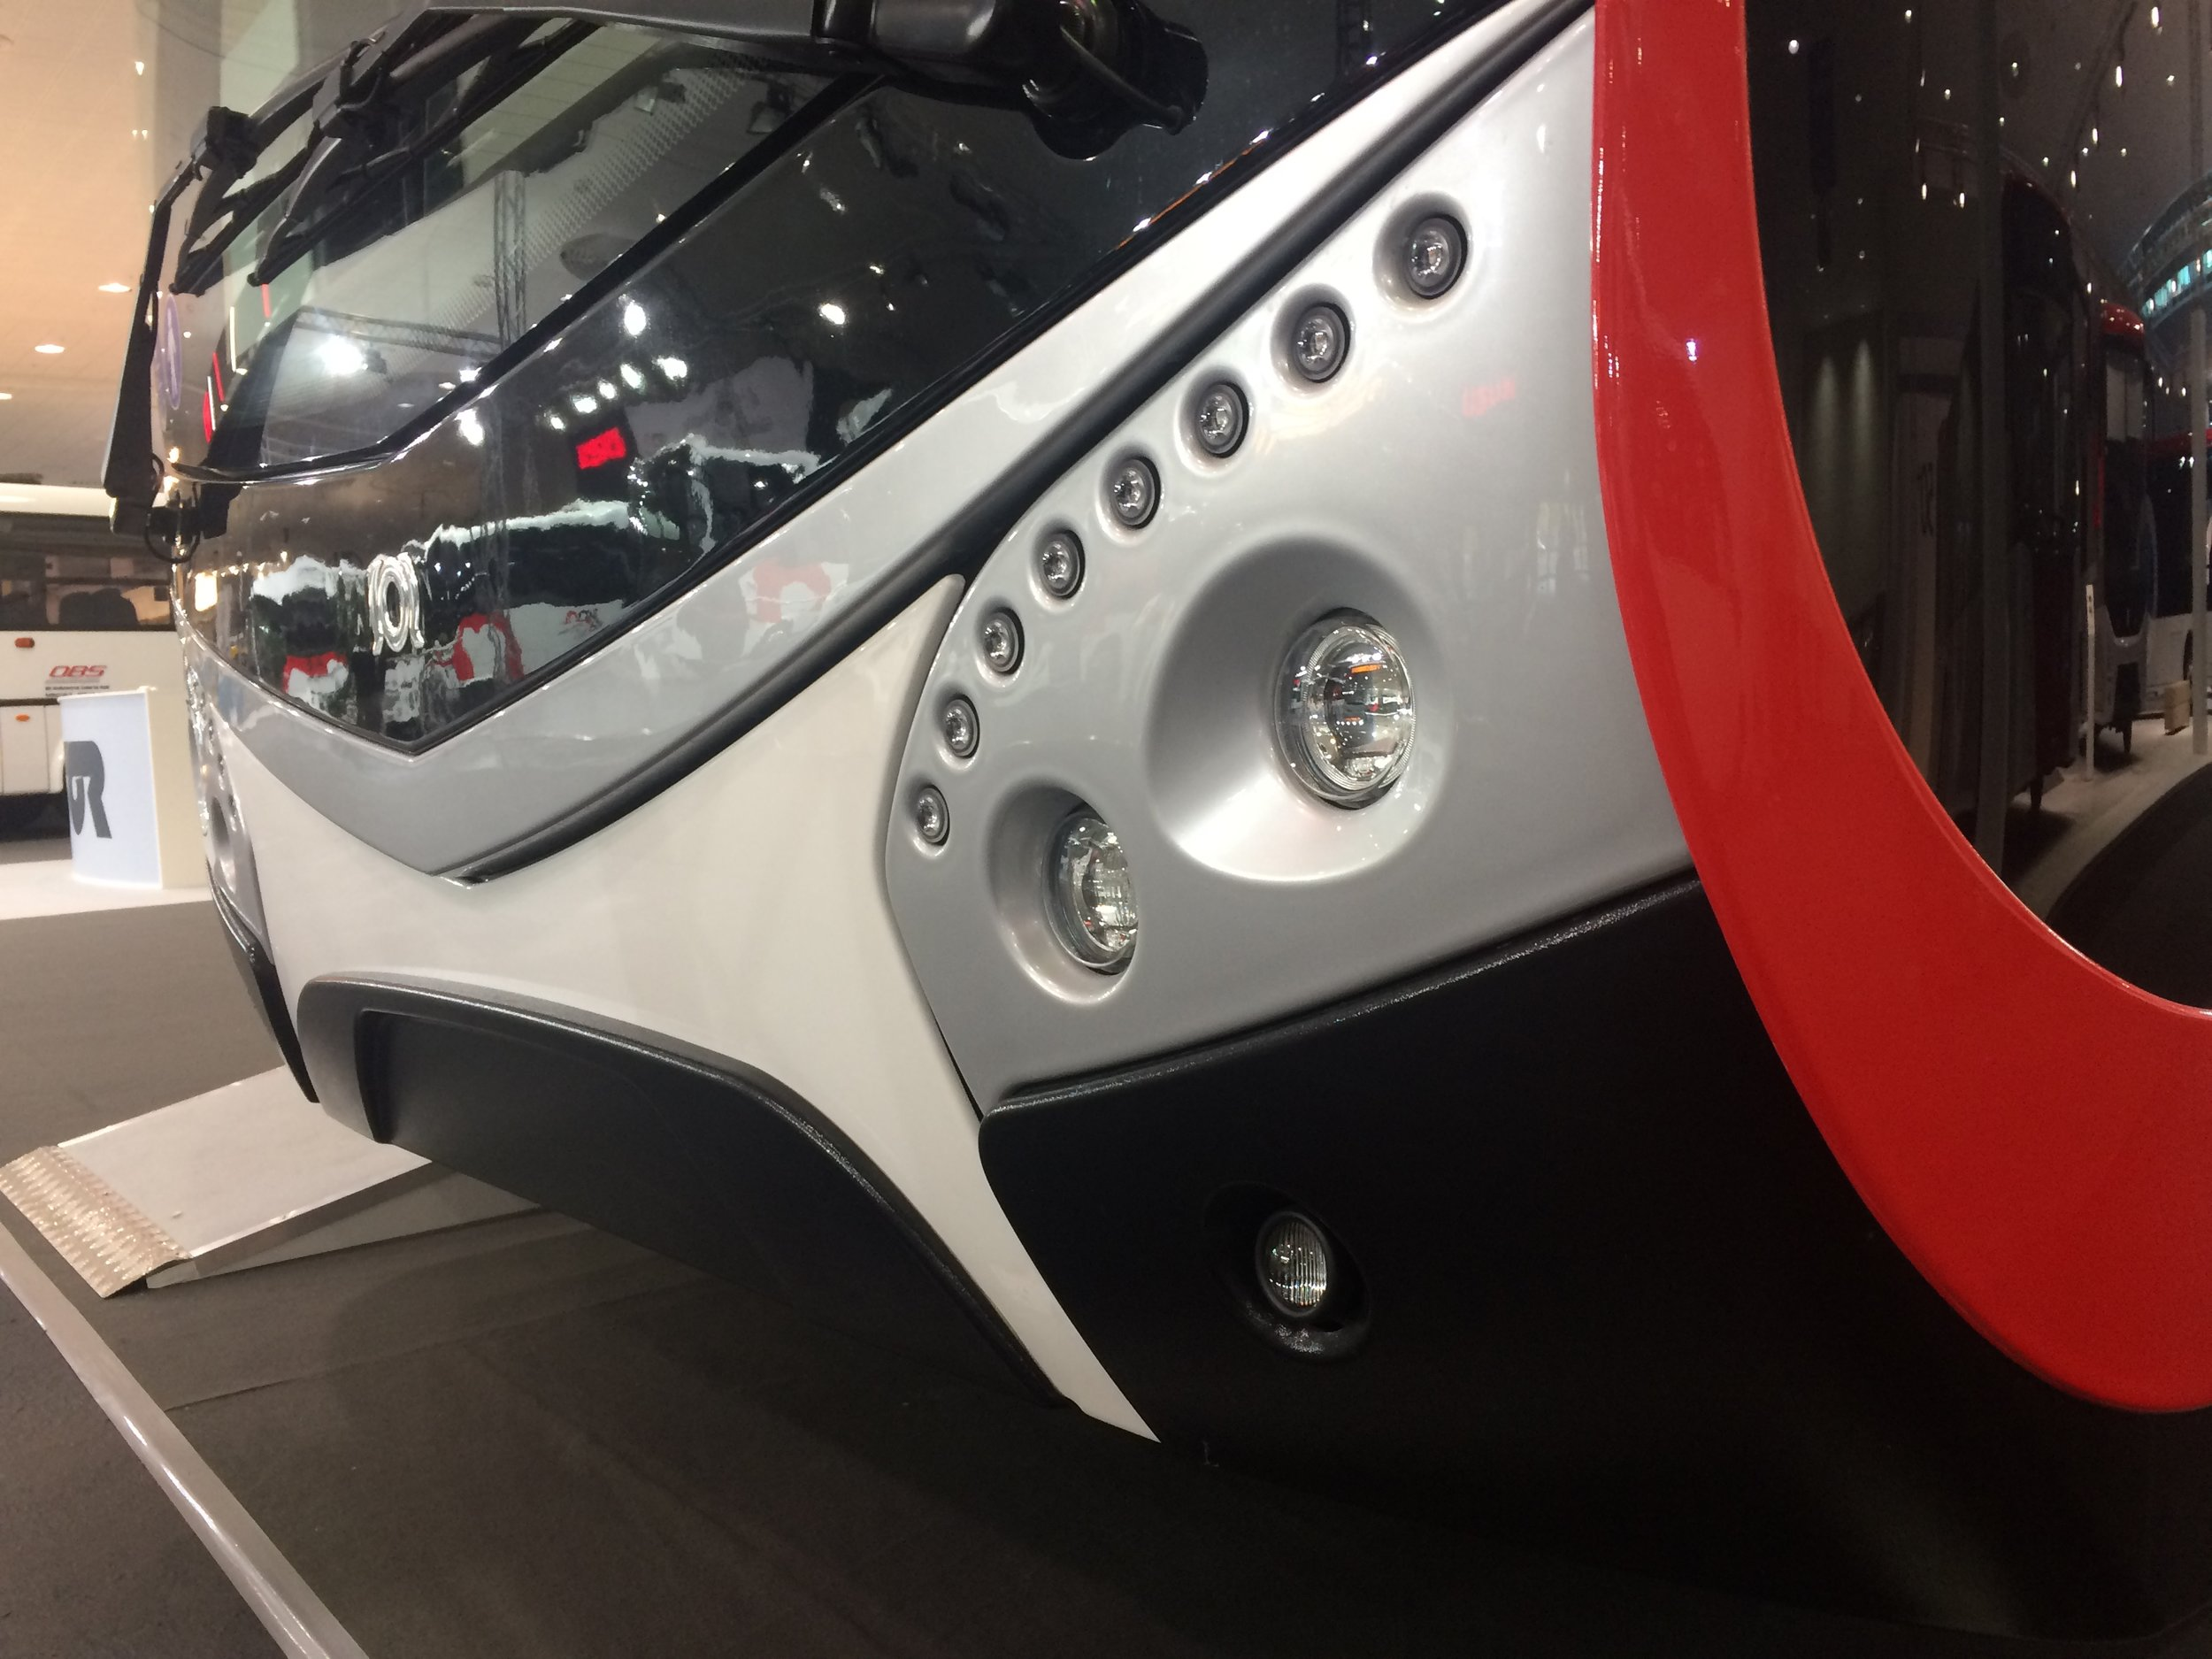 Detail čela vozidla. (foto: Libor Hinčica)